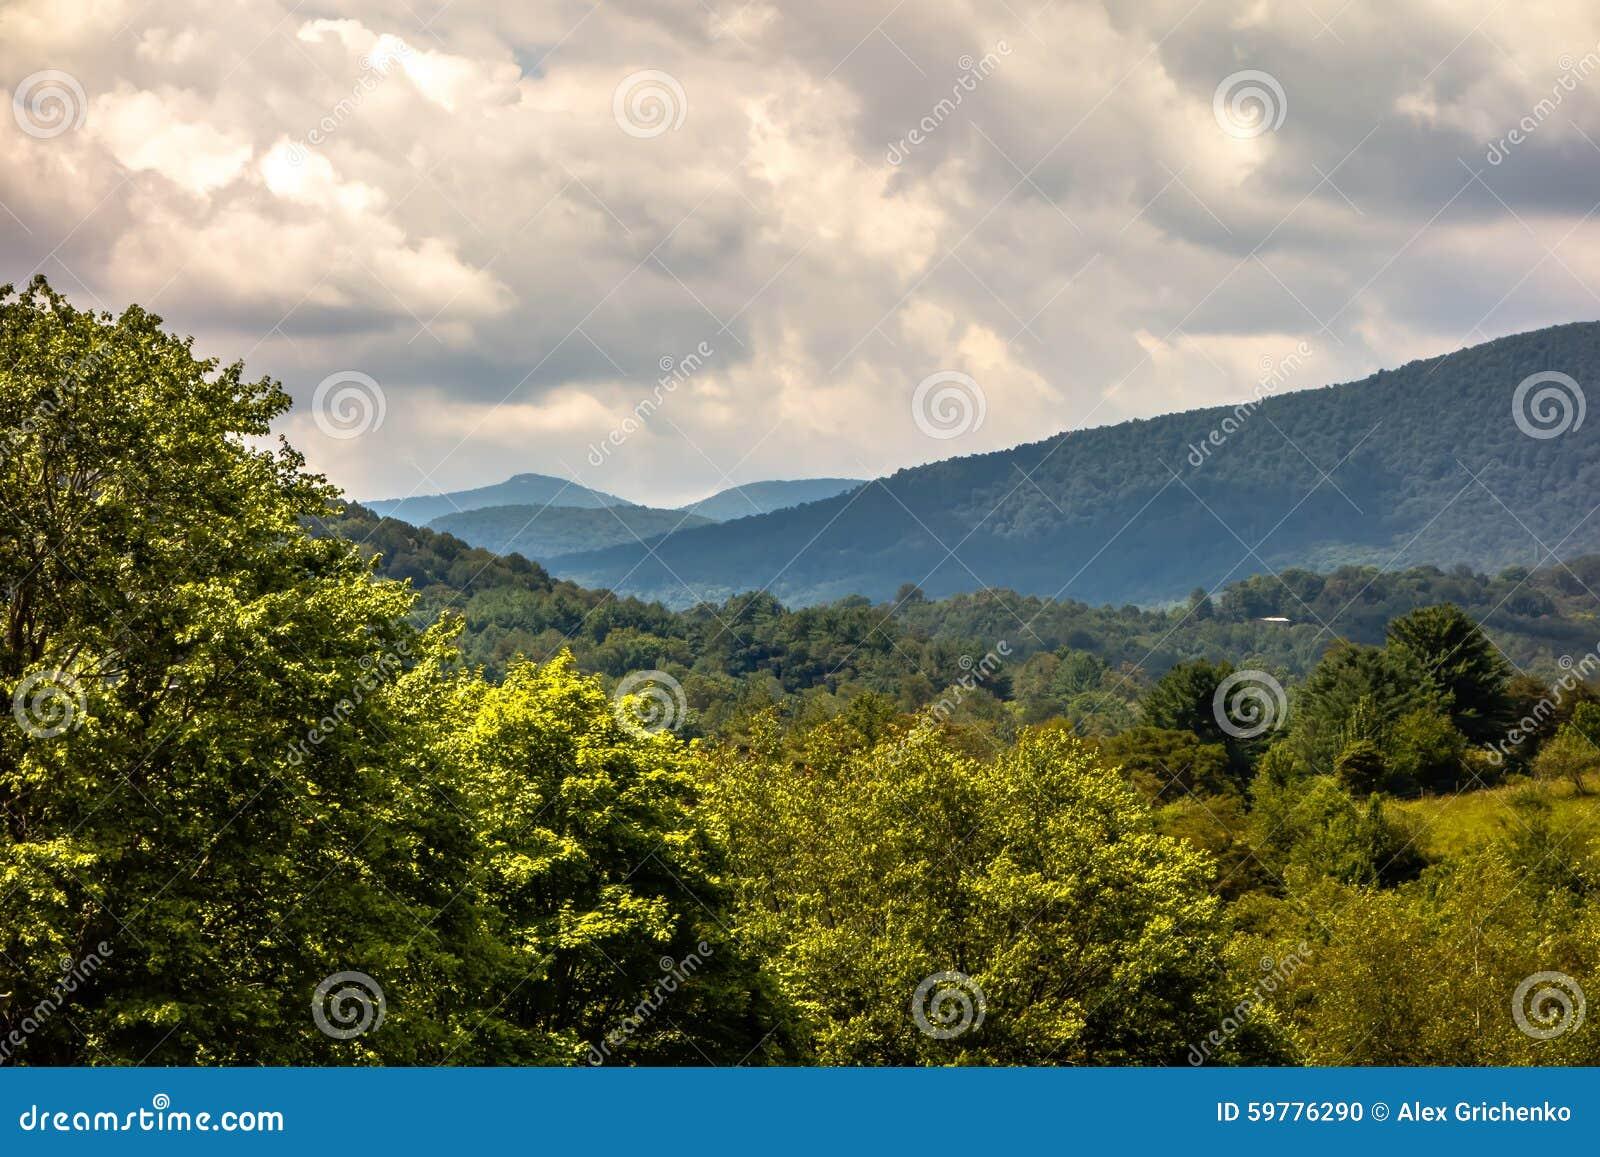 Montañas Carolina Seen From del norte de Ashe County el Ridge azul